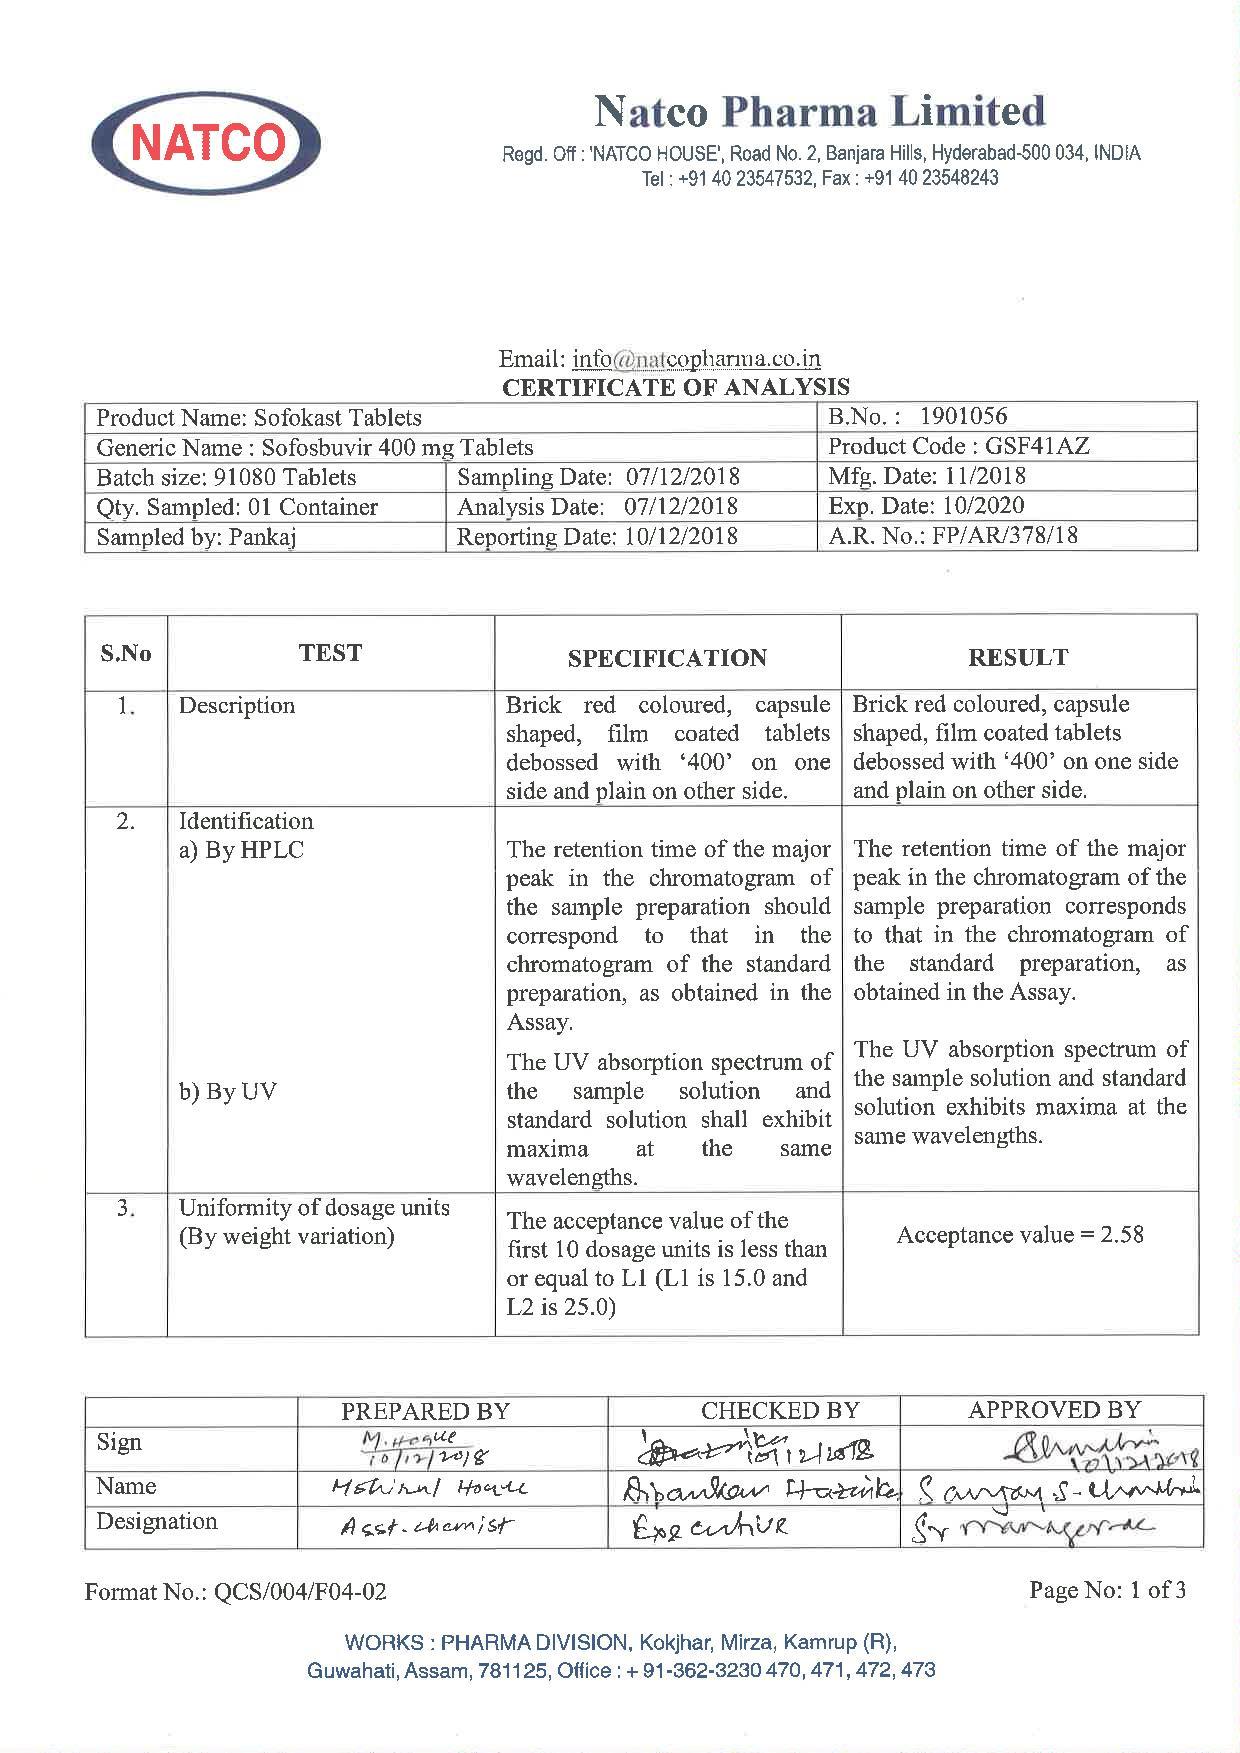 Сертификат качества Natco Pharma Limited №10